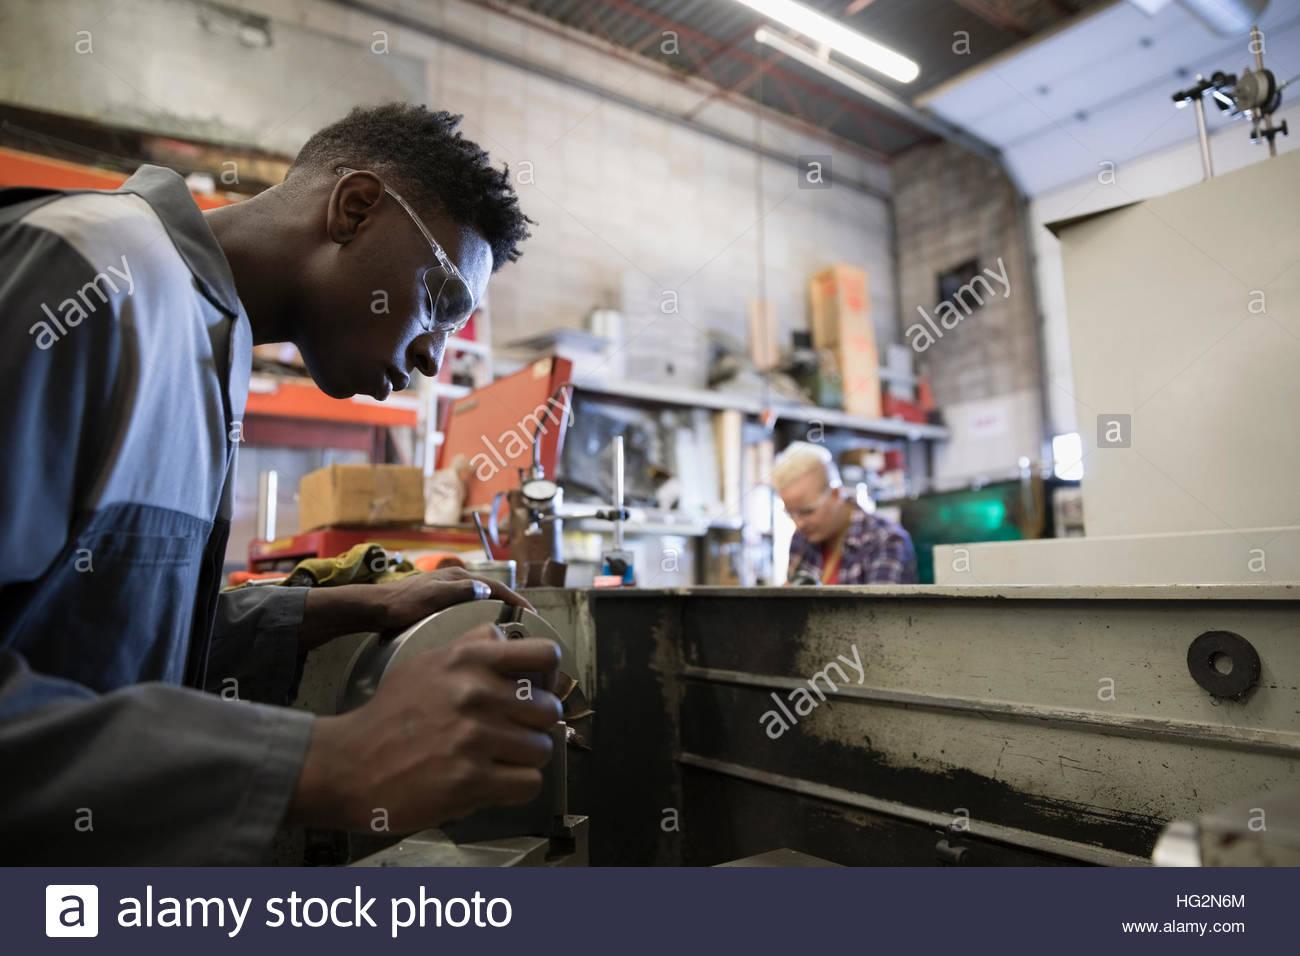 Design professional engineer using equipment in workshop - Stock Image